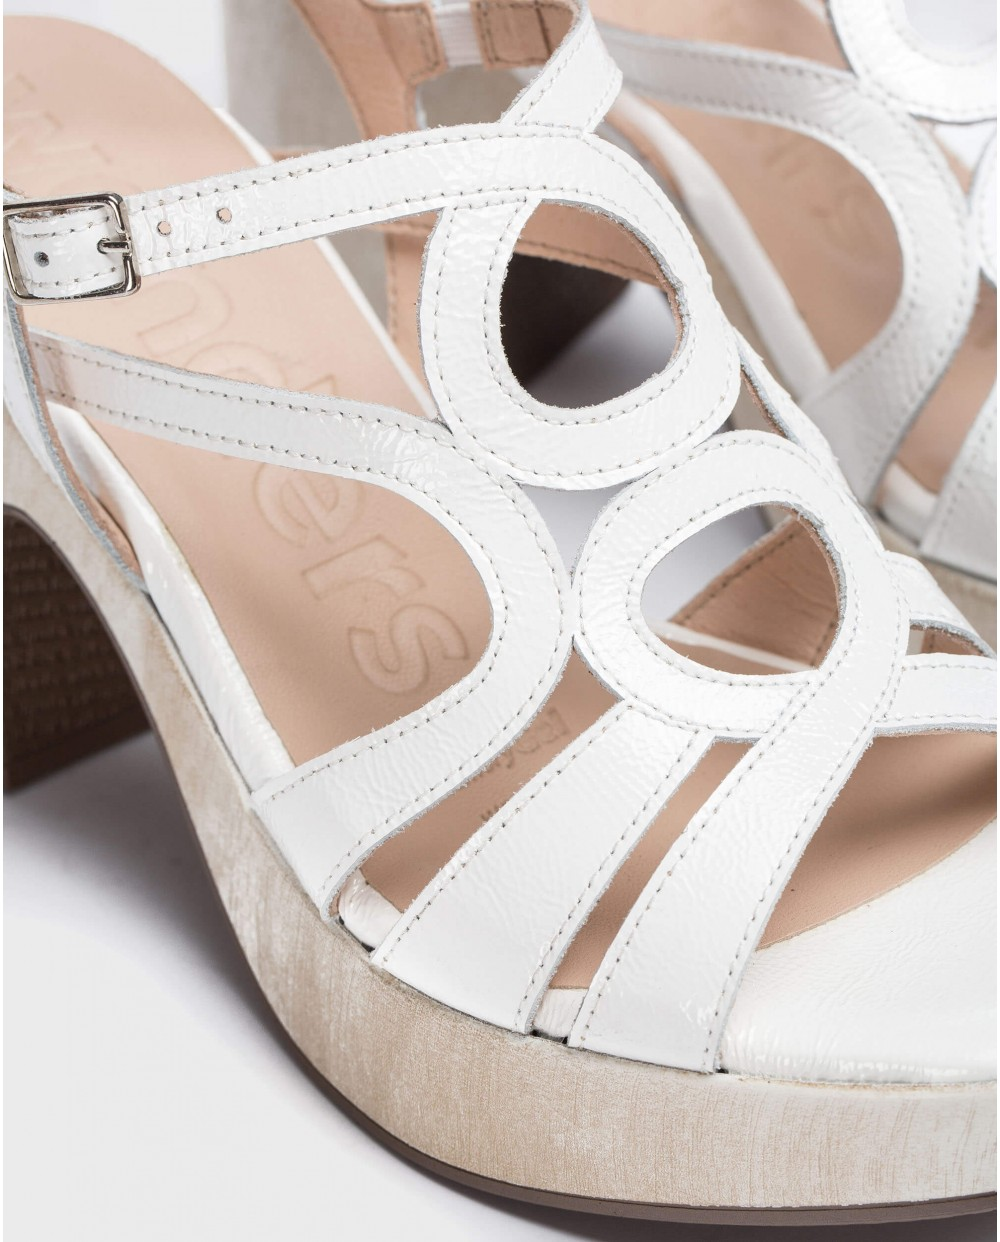 Wonders-Sandals-Sandal with circles